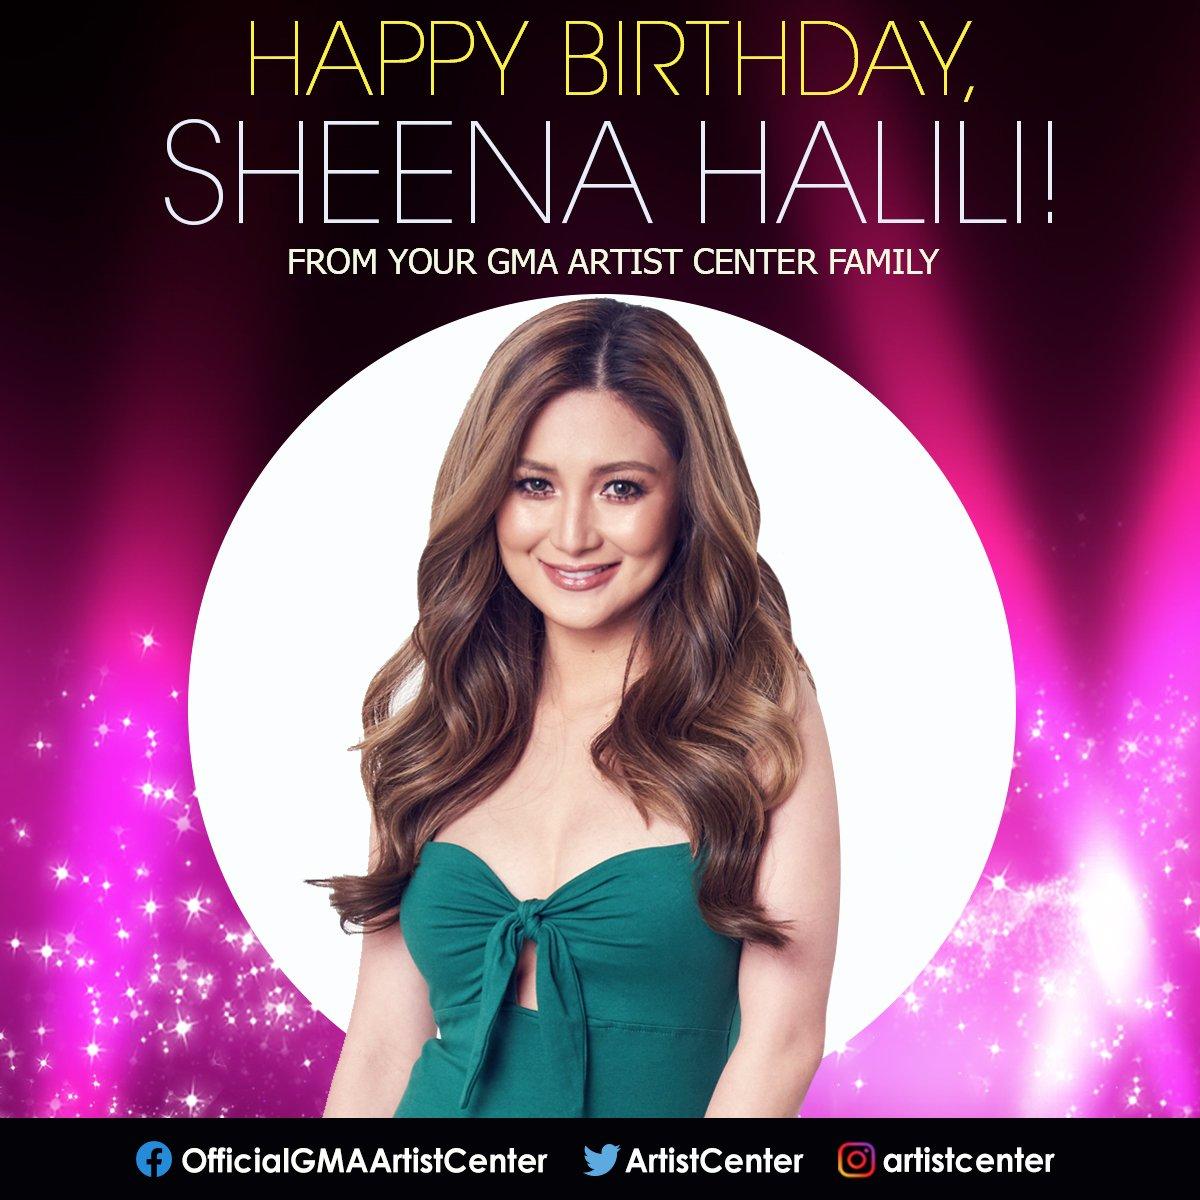 Happy Birthday, #SheenaHalili (@mysheenahalili)! We hope all your birthday wishes come true! ❤️🎁🎂 https://t.co/5QQjlzAtHD